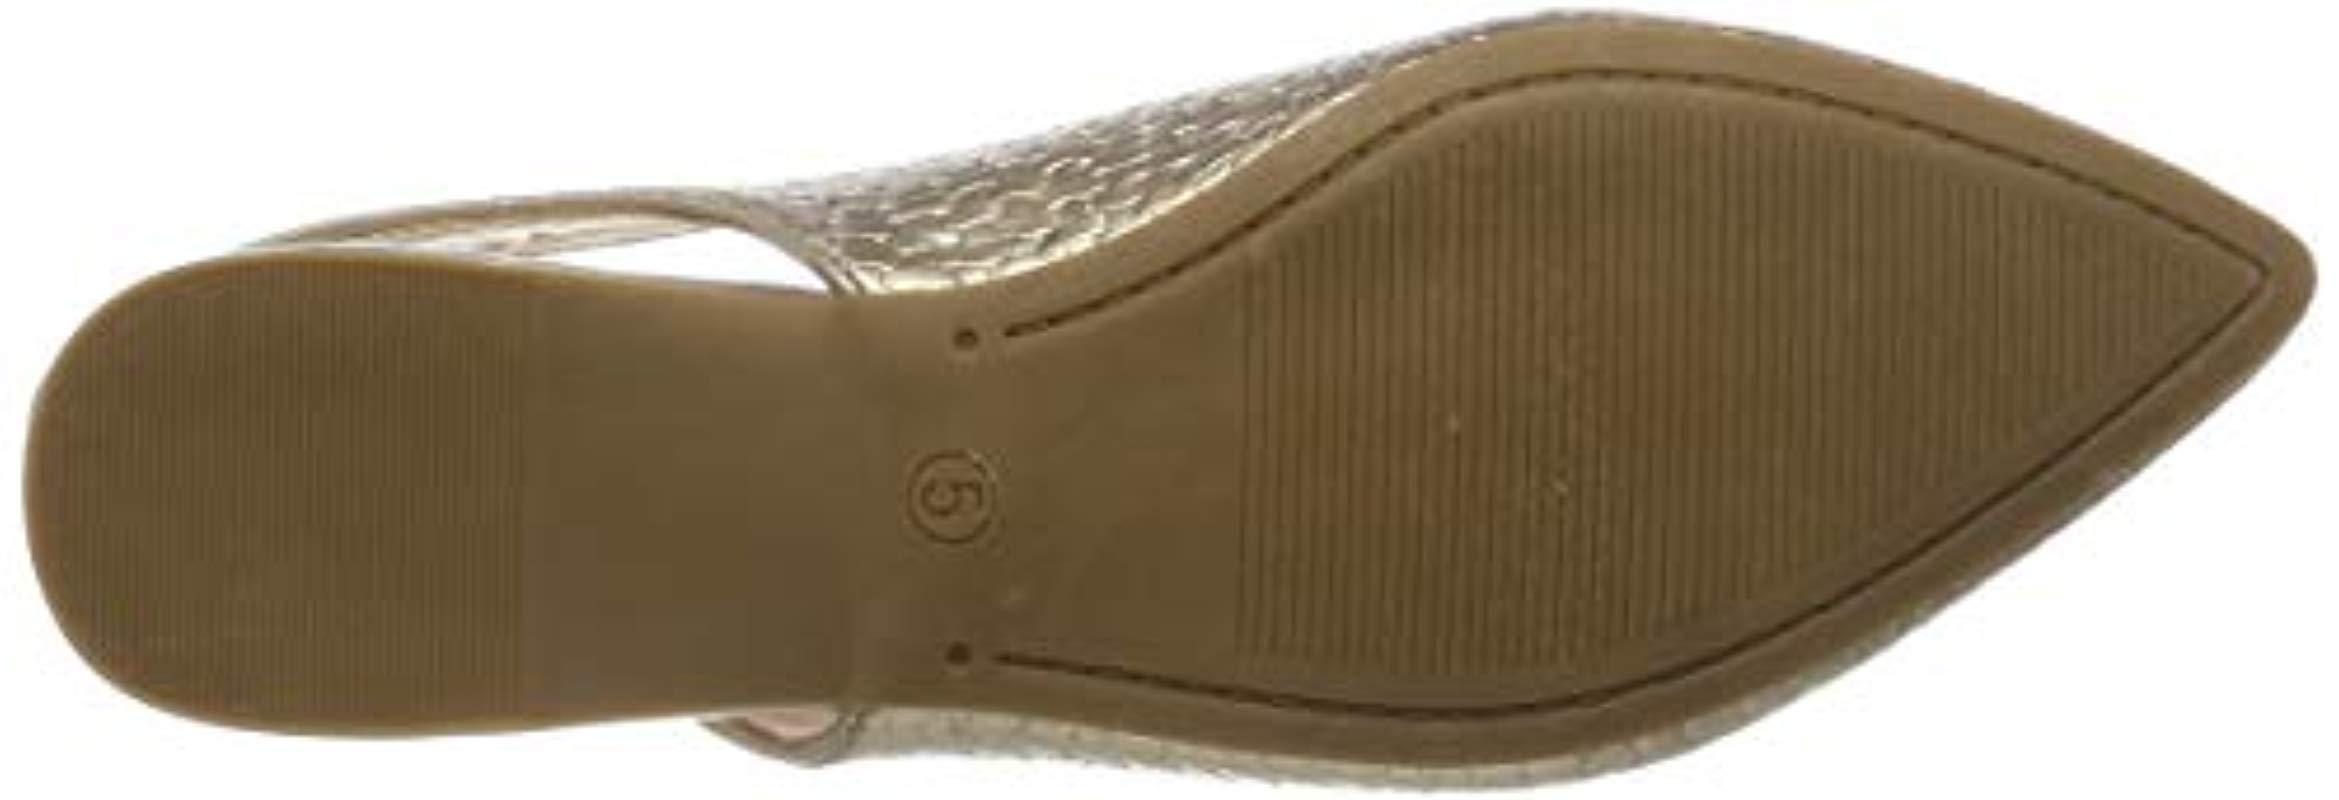 9858b7153 dorothy-perkins-Gold-Gold-420-Palermo-Closed-Toe-Heels.jpeg